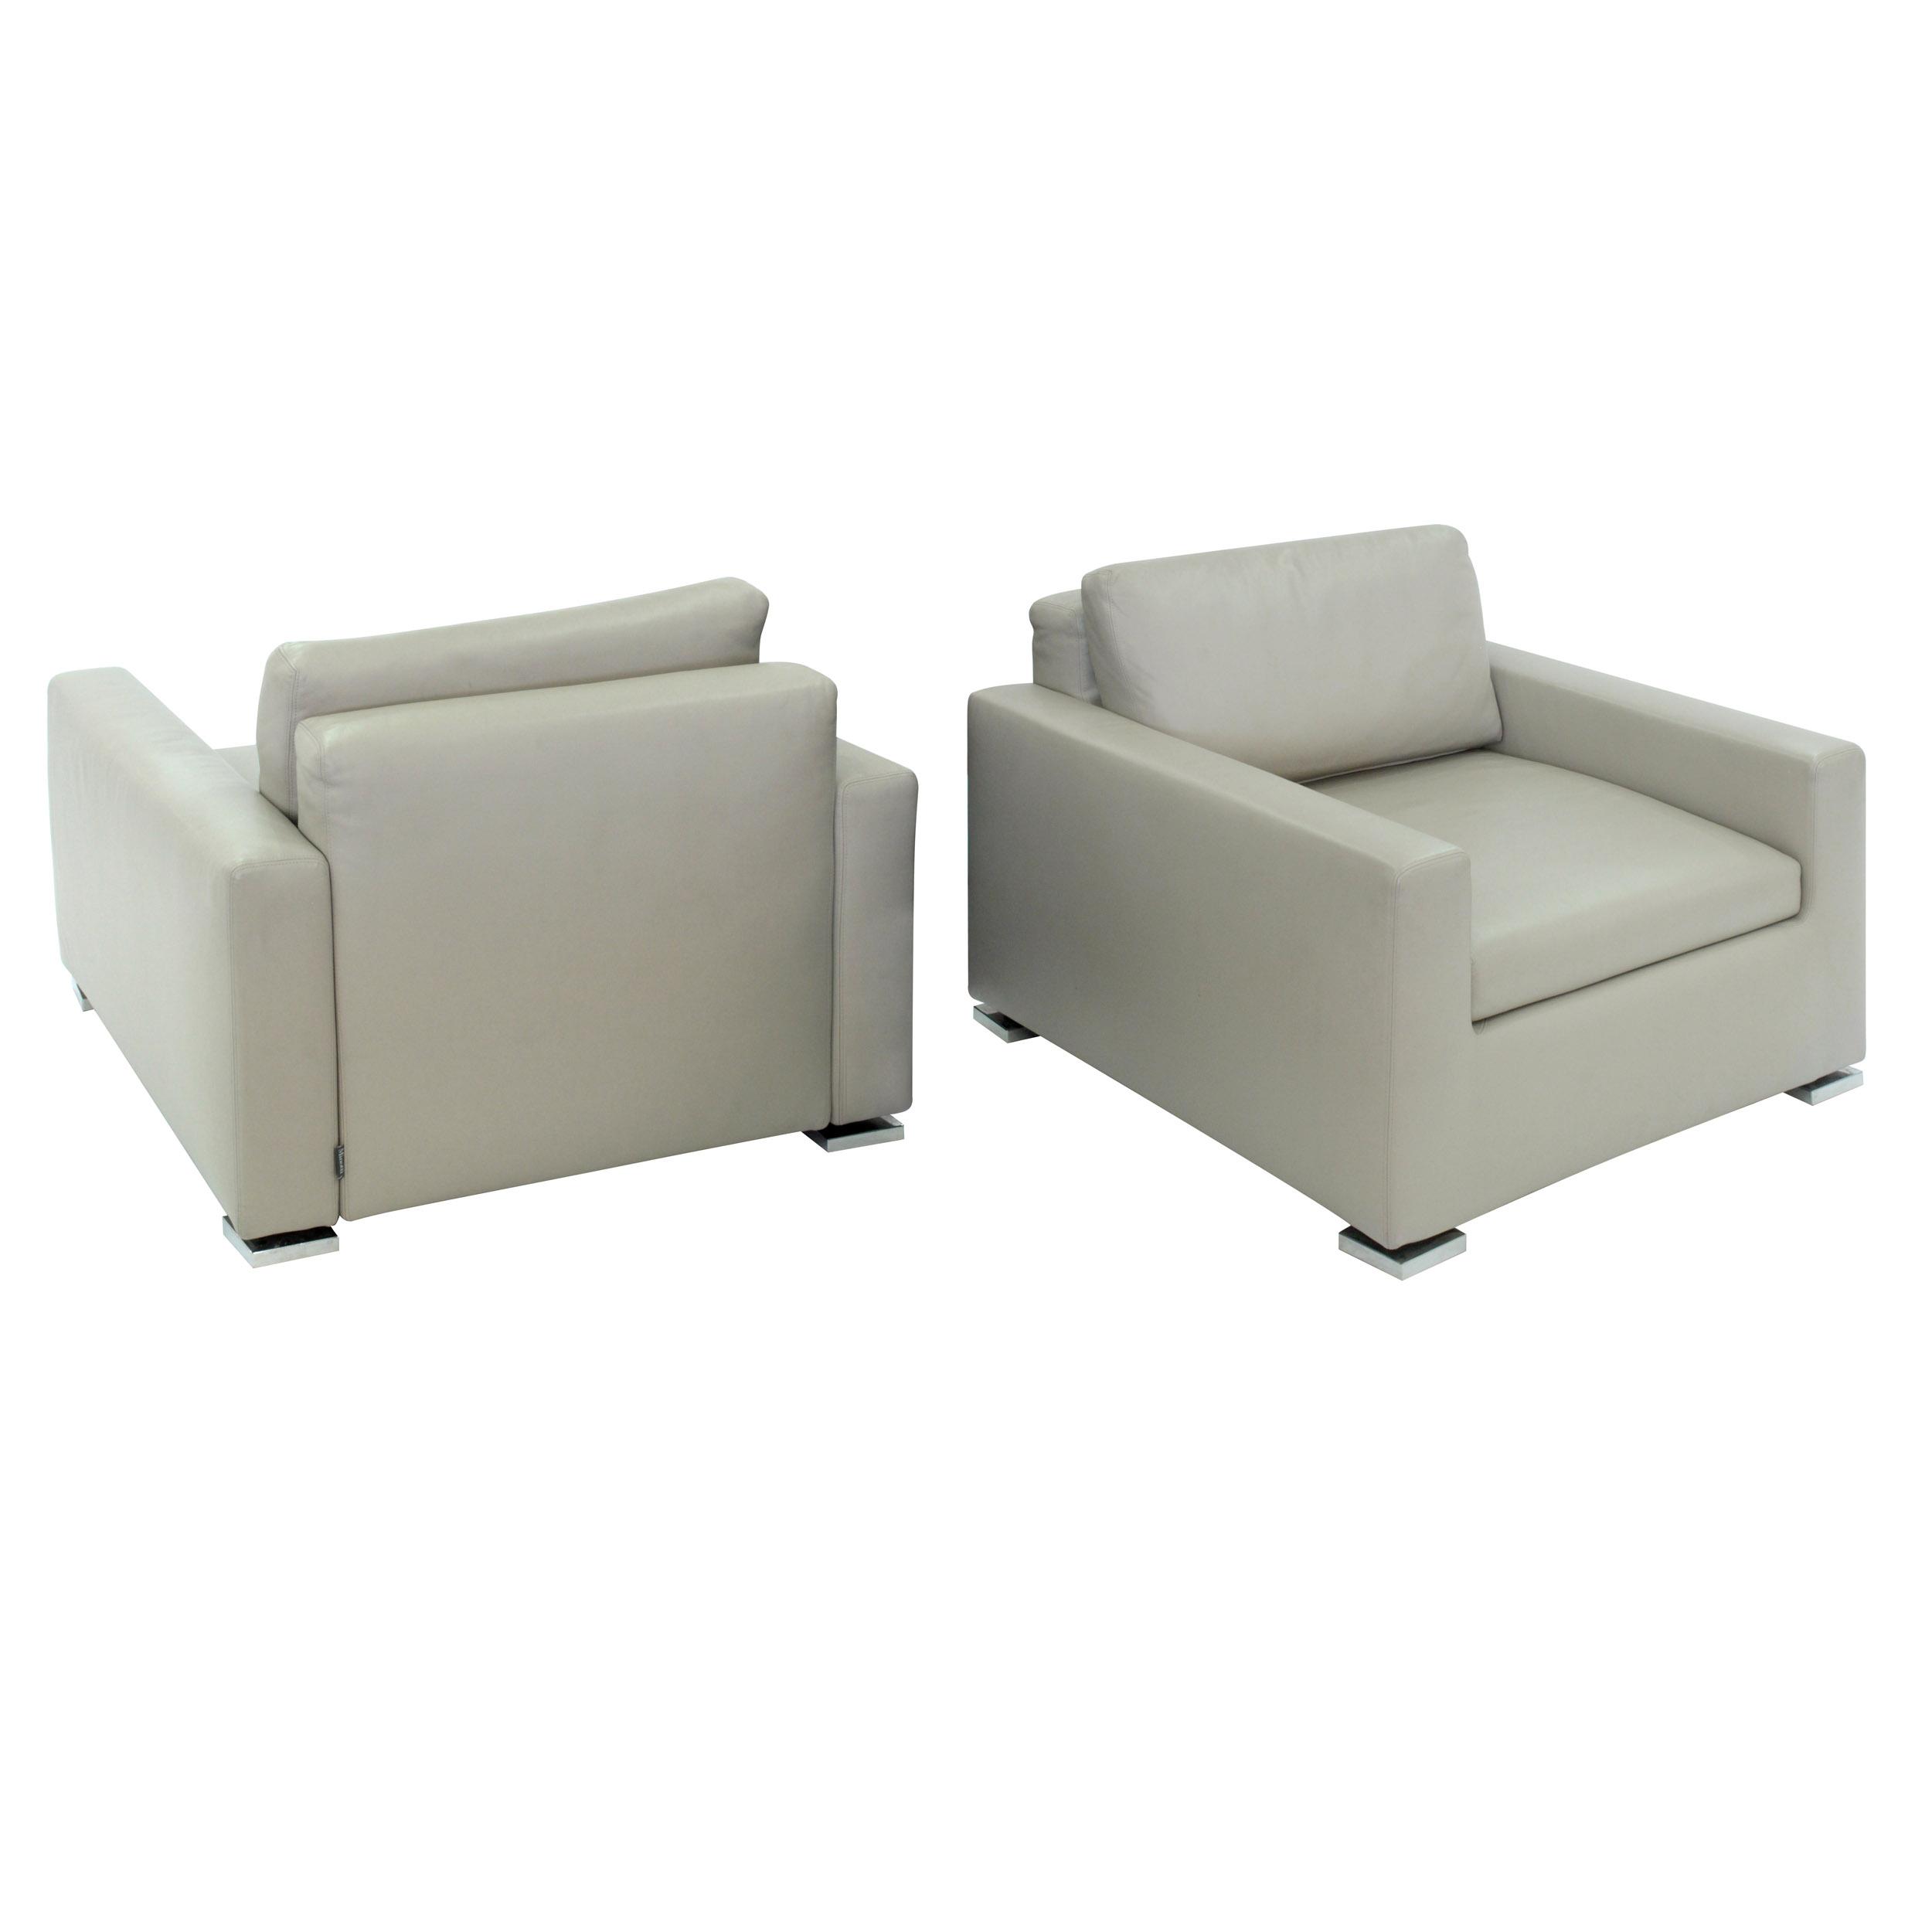 Minotti 65 cleanline lthr clubchairs54 hires sqr.jpg